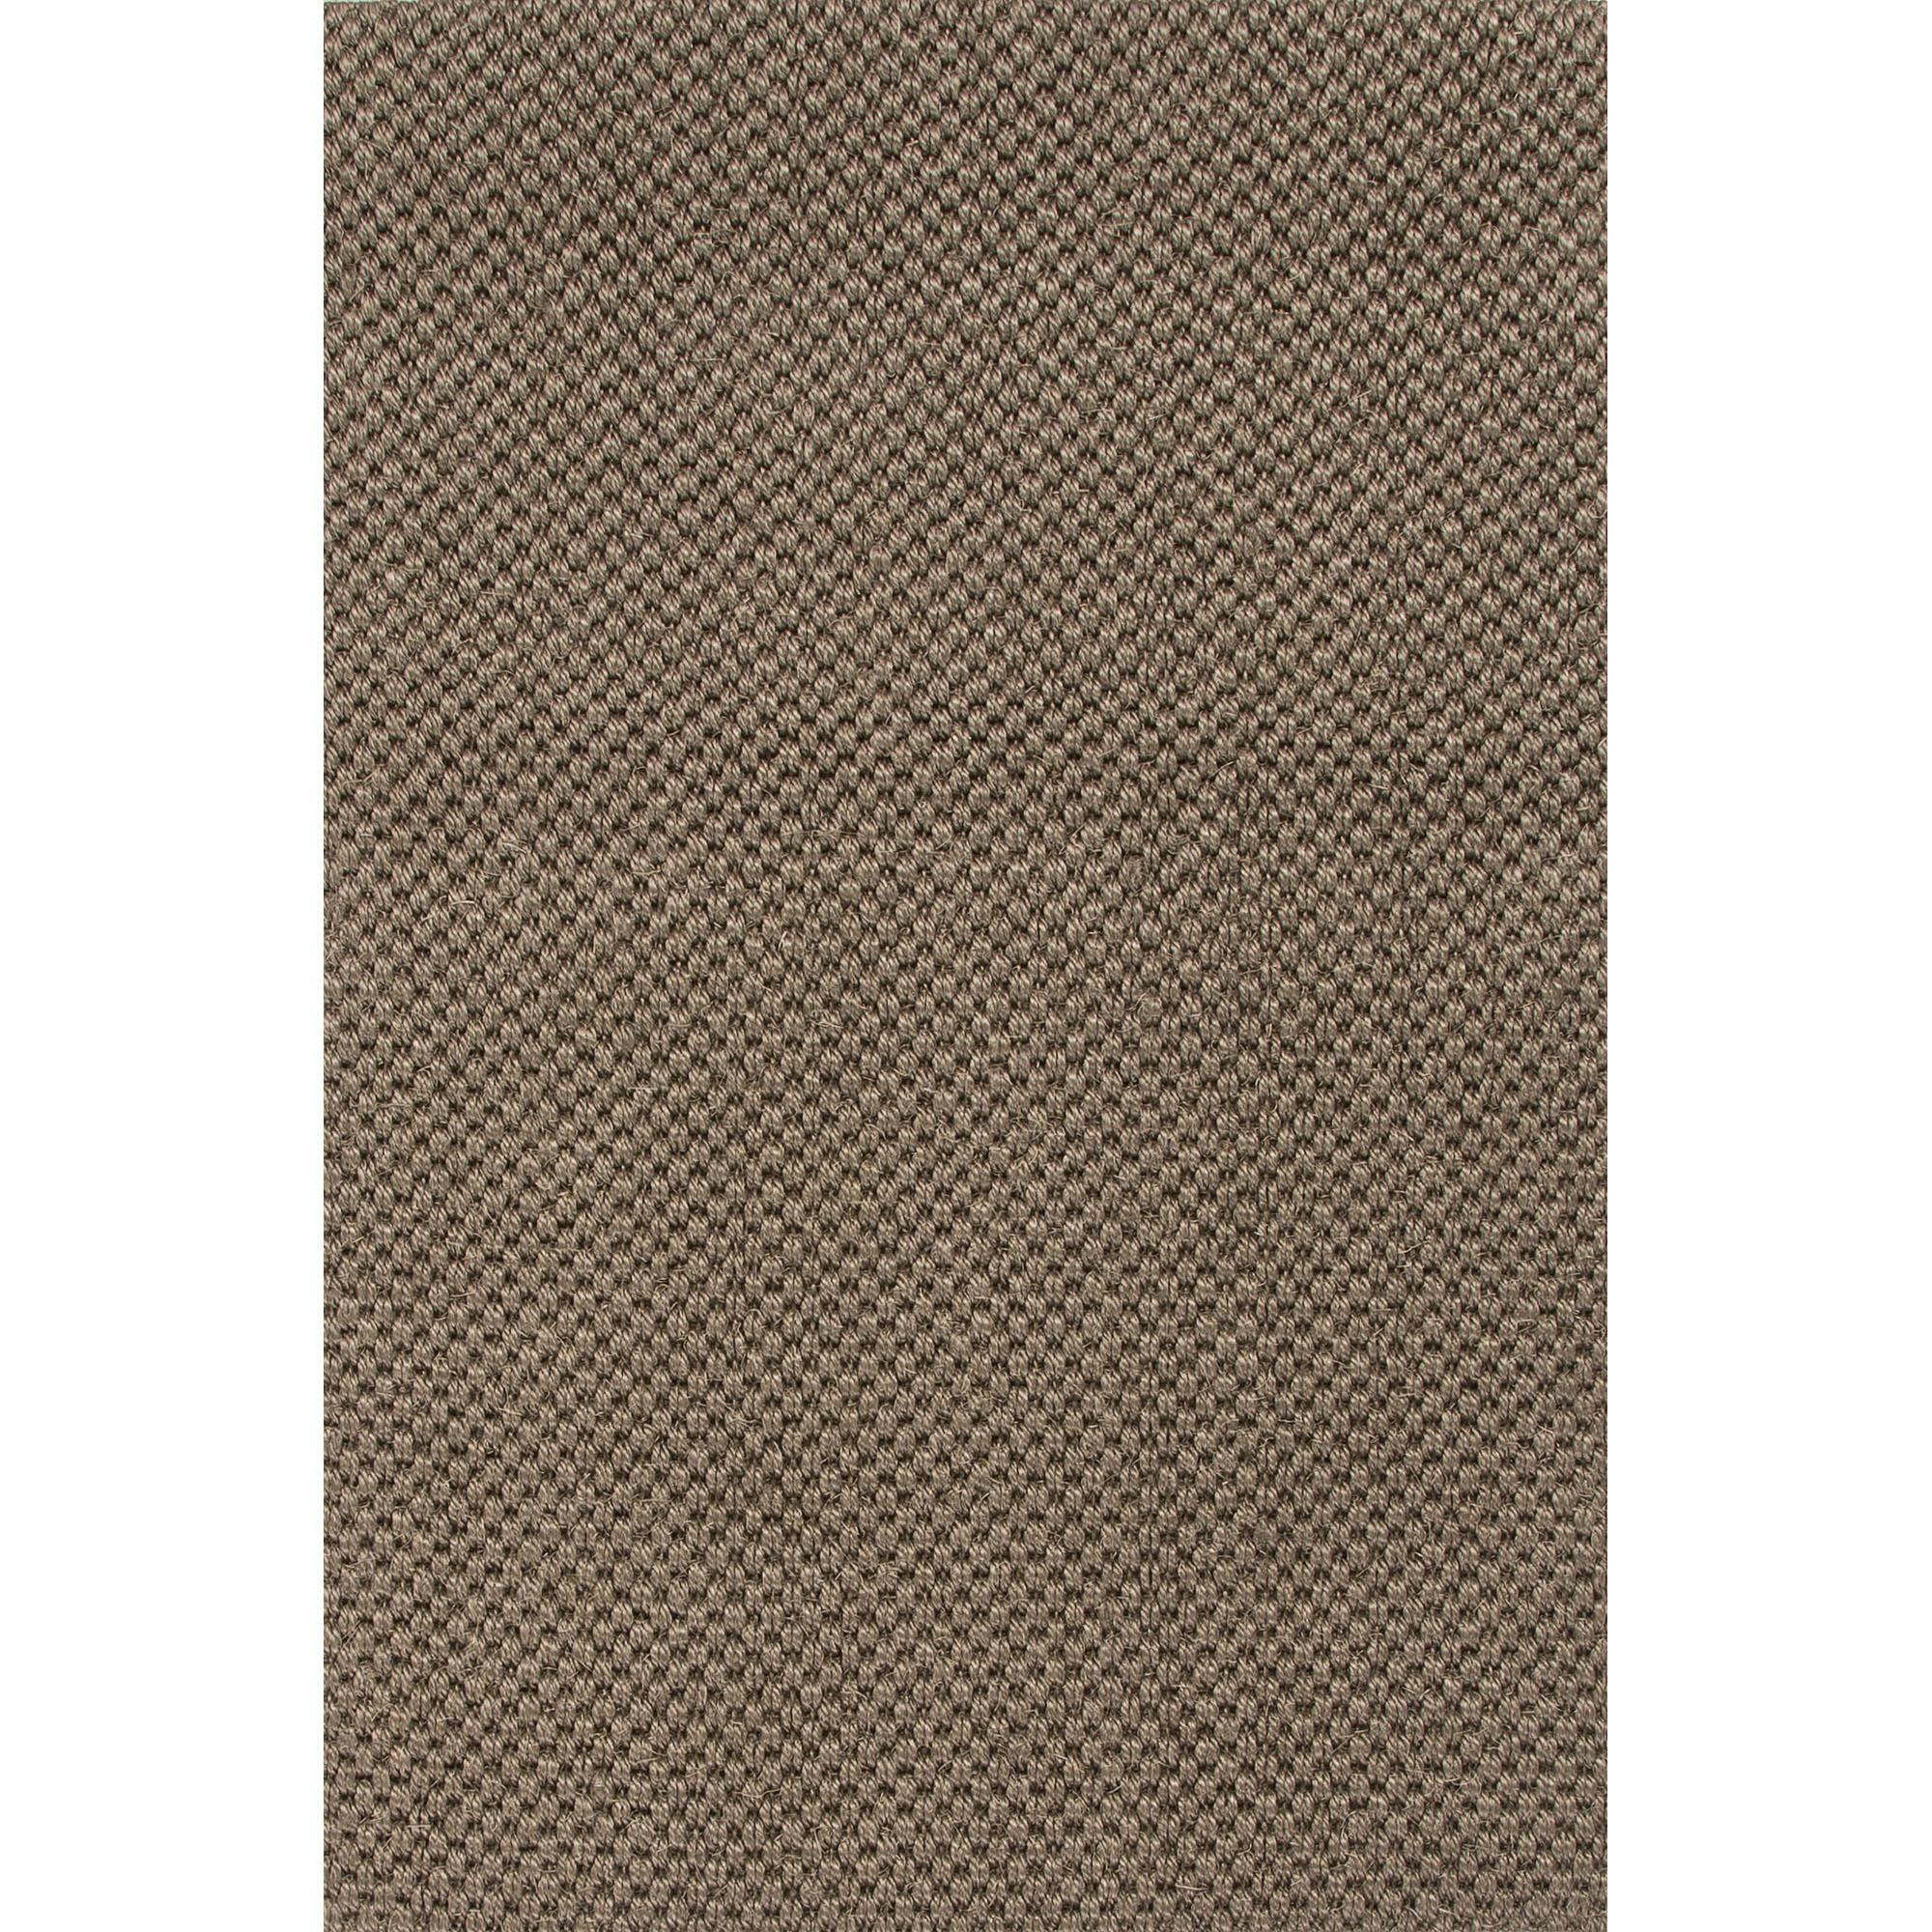 JAIPUR Rugs Naturals Sanibel 8 x 10 Rug - Item Number: RUG119165